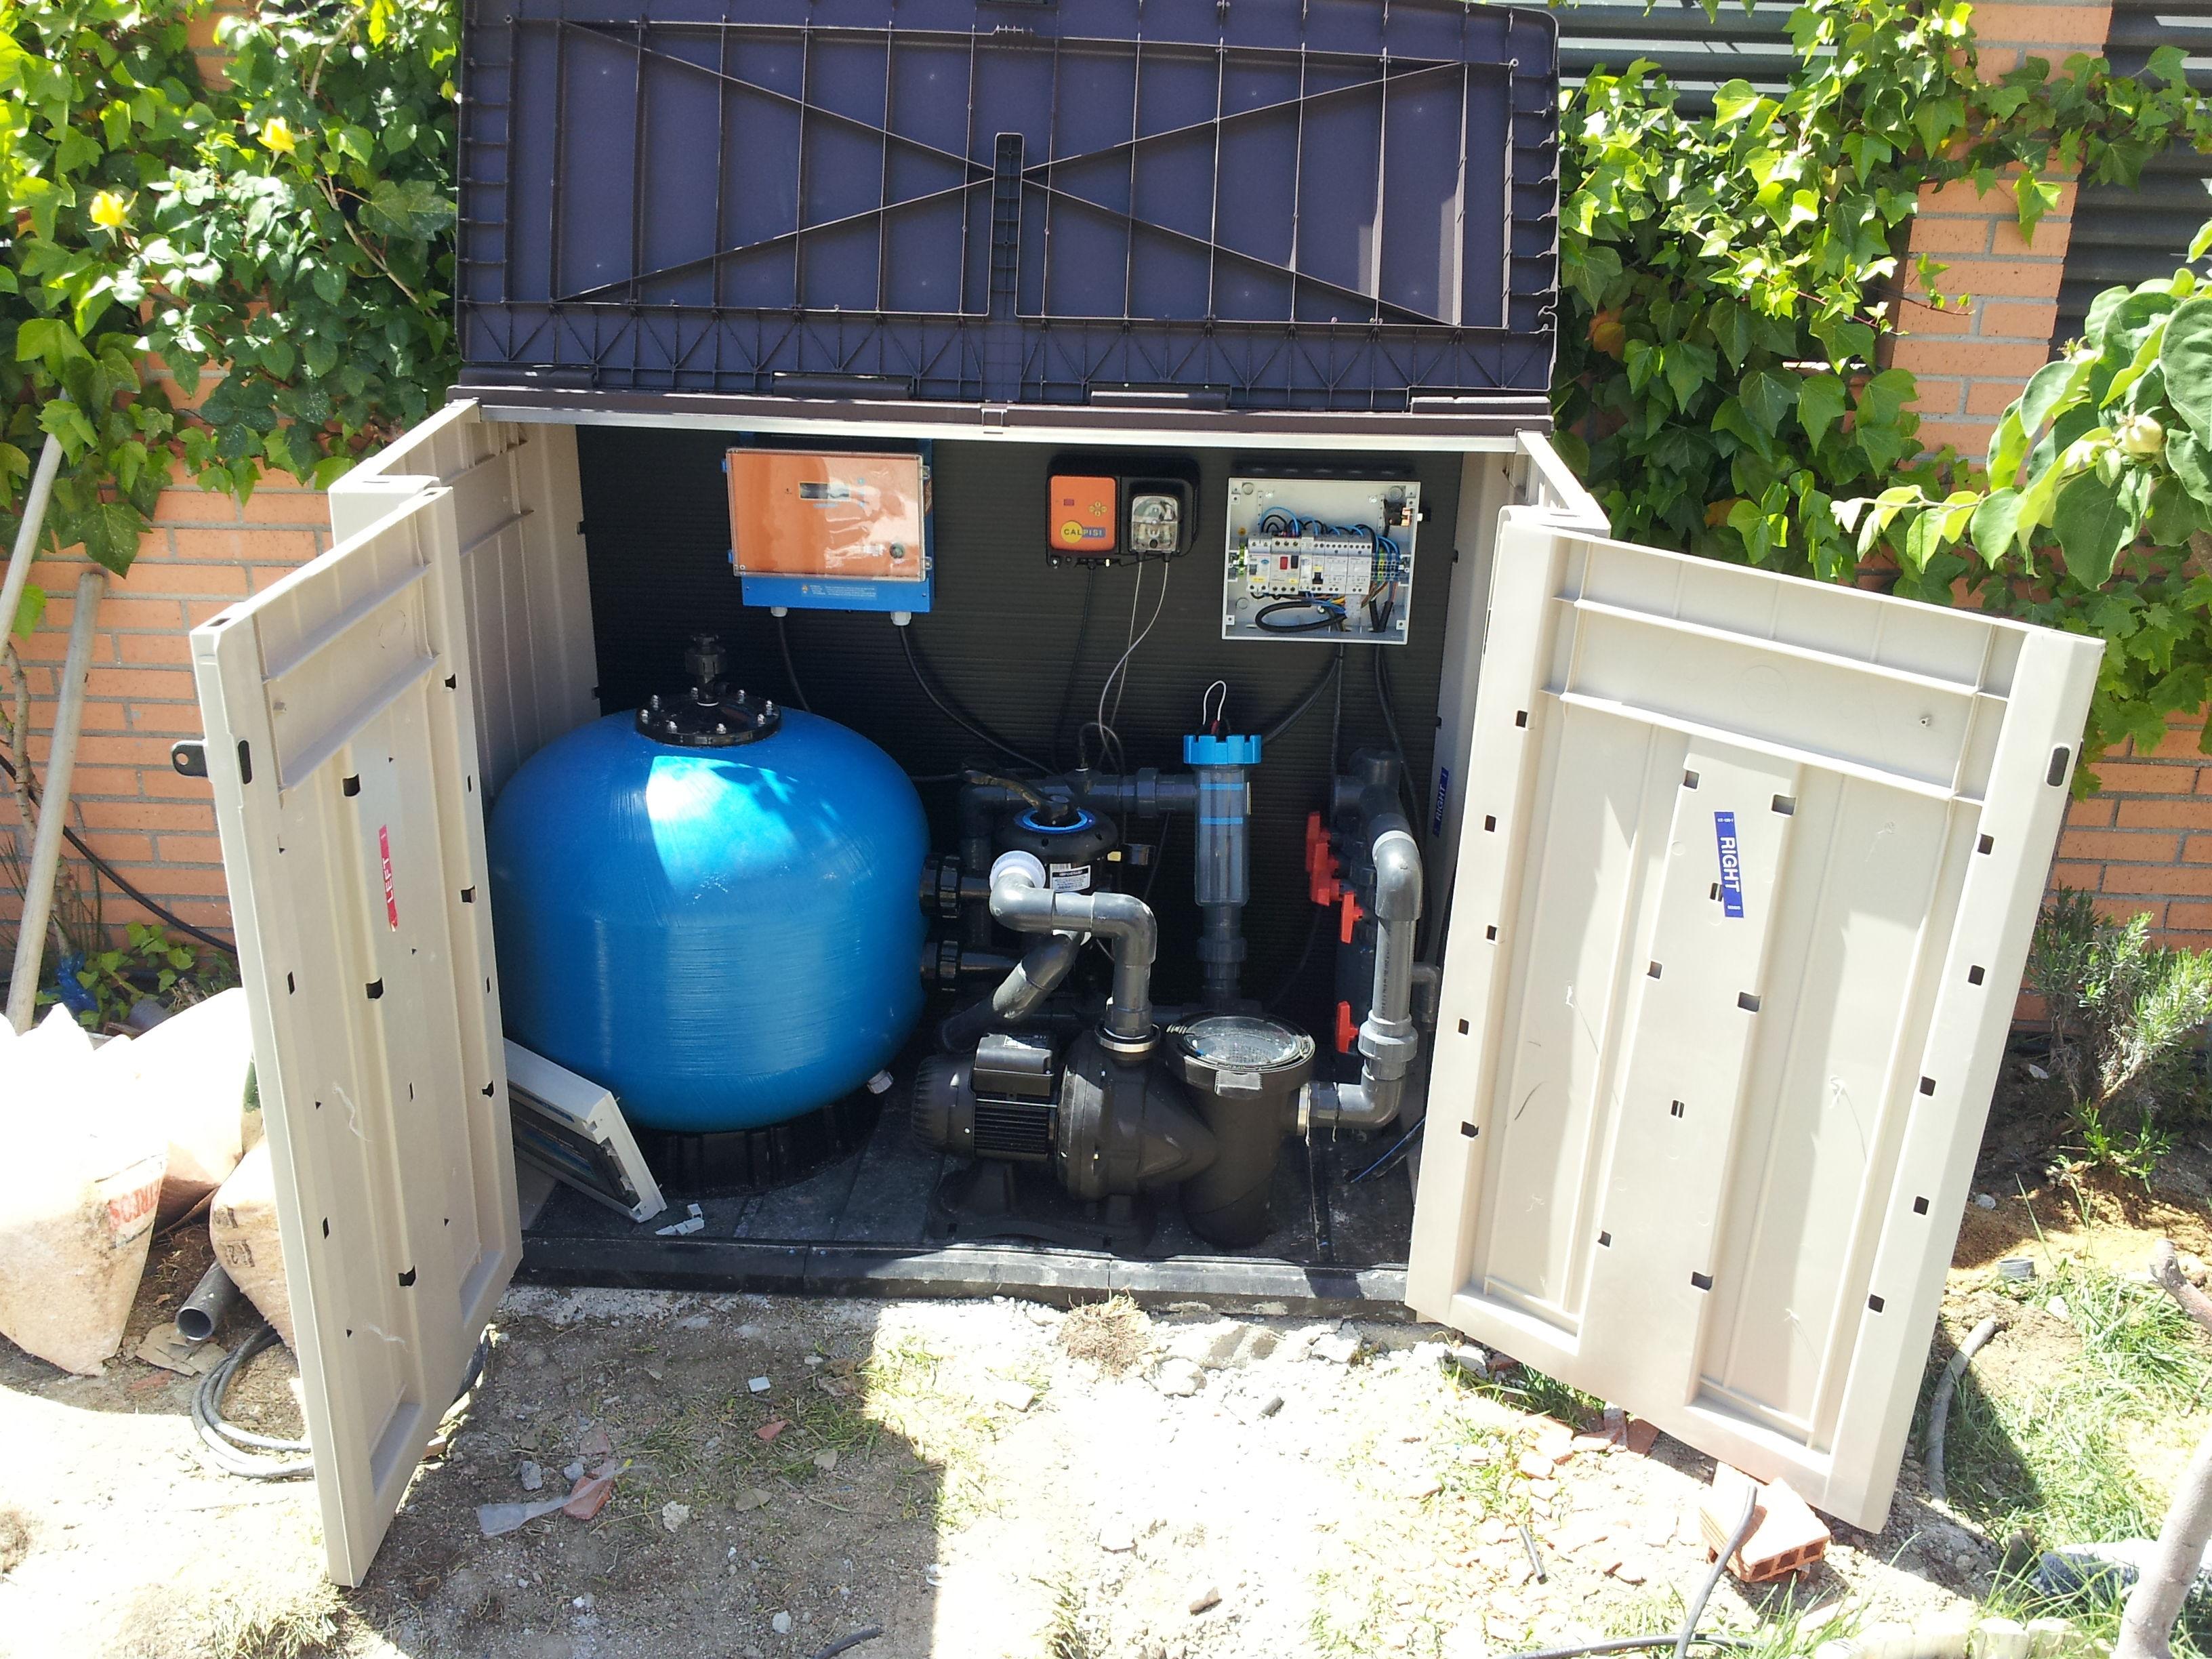 Depuradora de exterior cat logo de piscinas lualpool for Piscinas rectangulares con depuradora